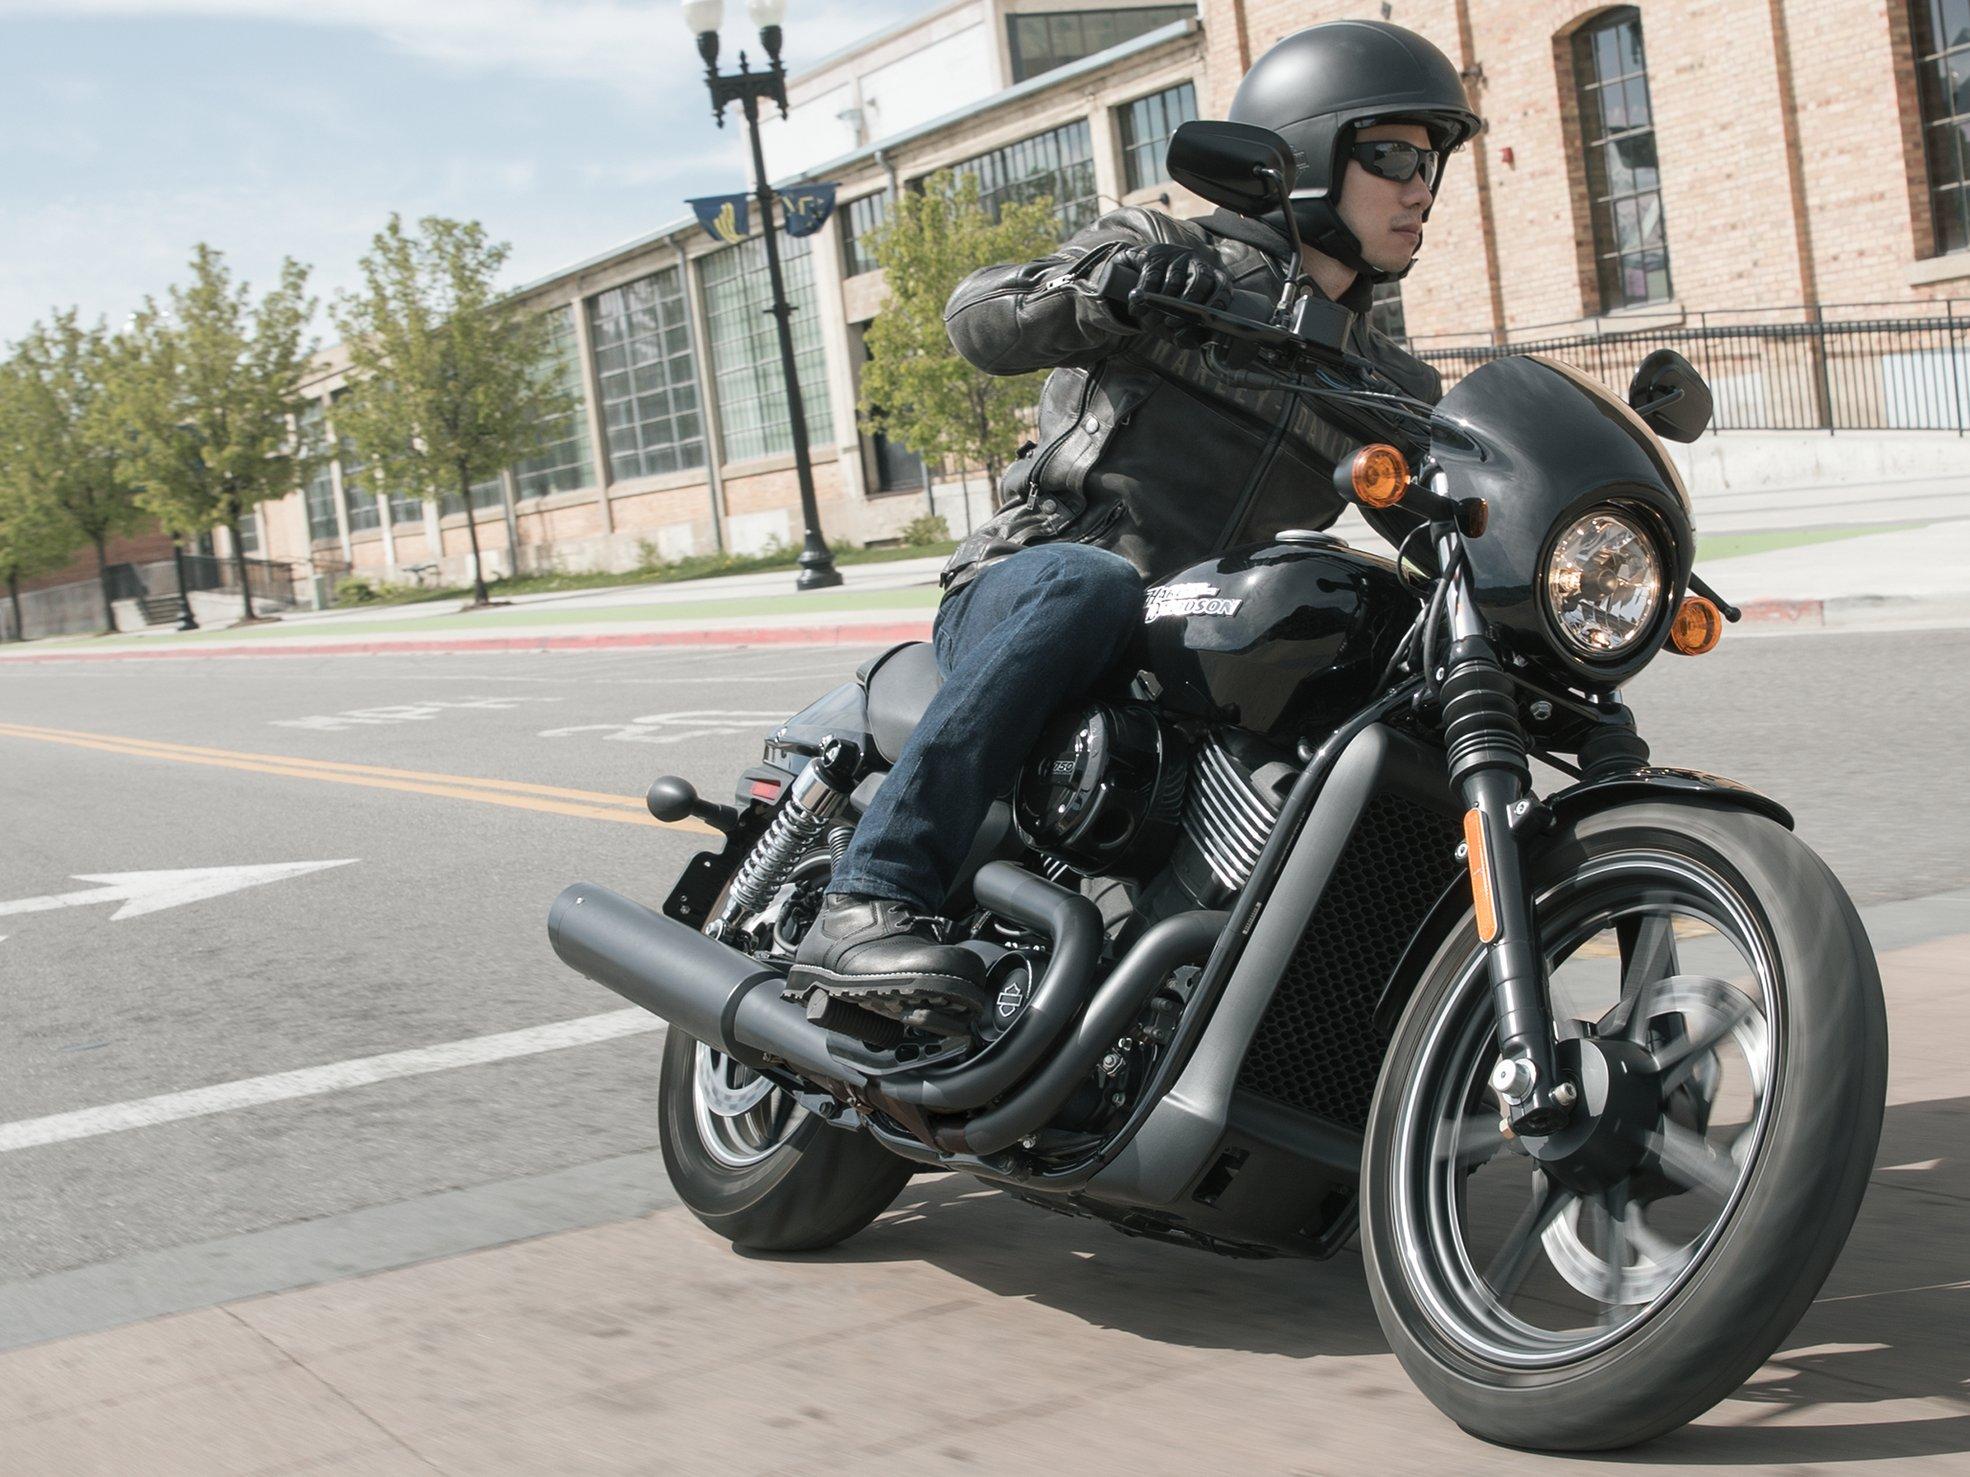 2018 Harley-Davidson Street 750 | Harley-Davidson India